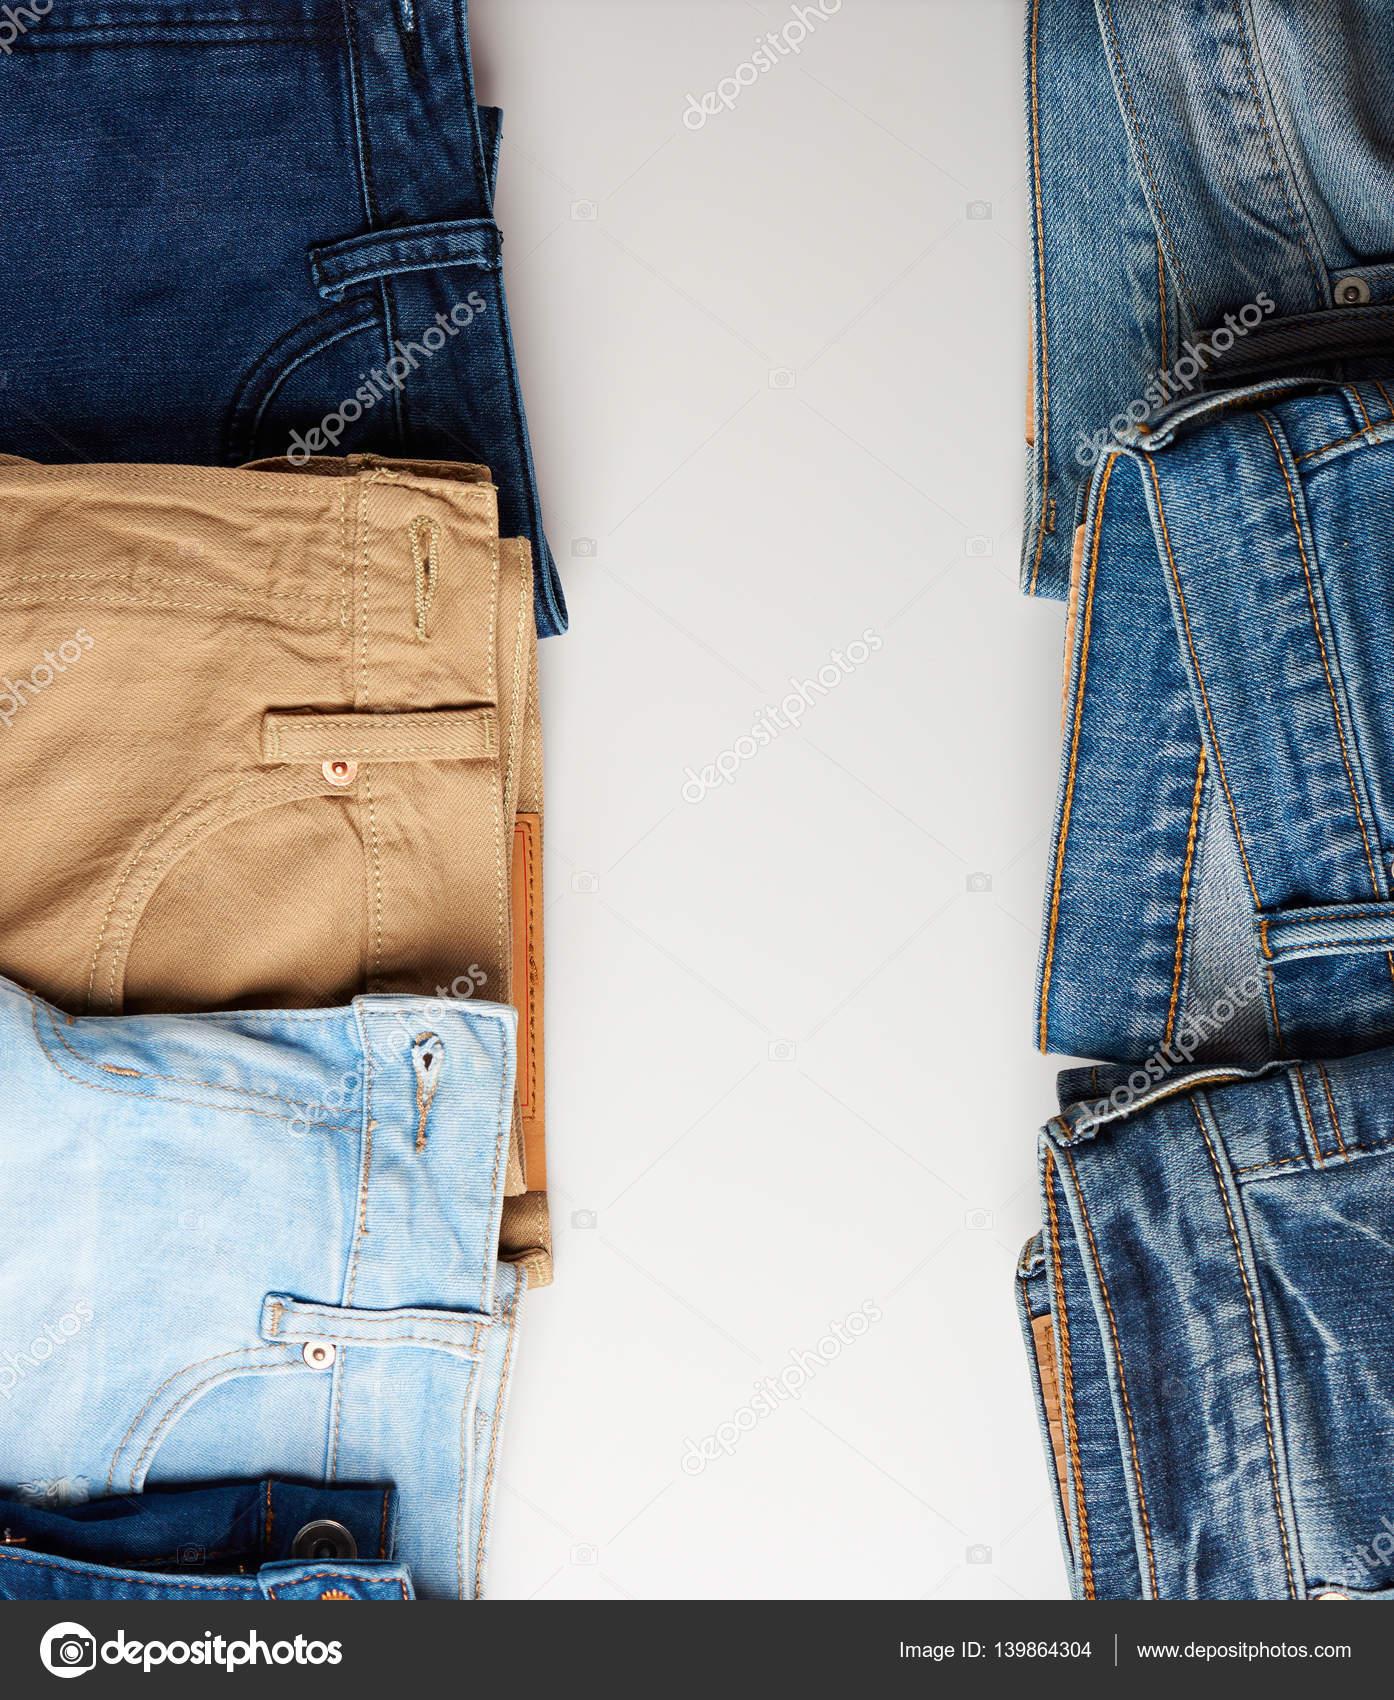 Vertikalen Rahmen des Jeans-boarder — Stockfoto © dimarik #139864304